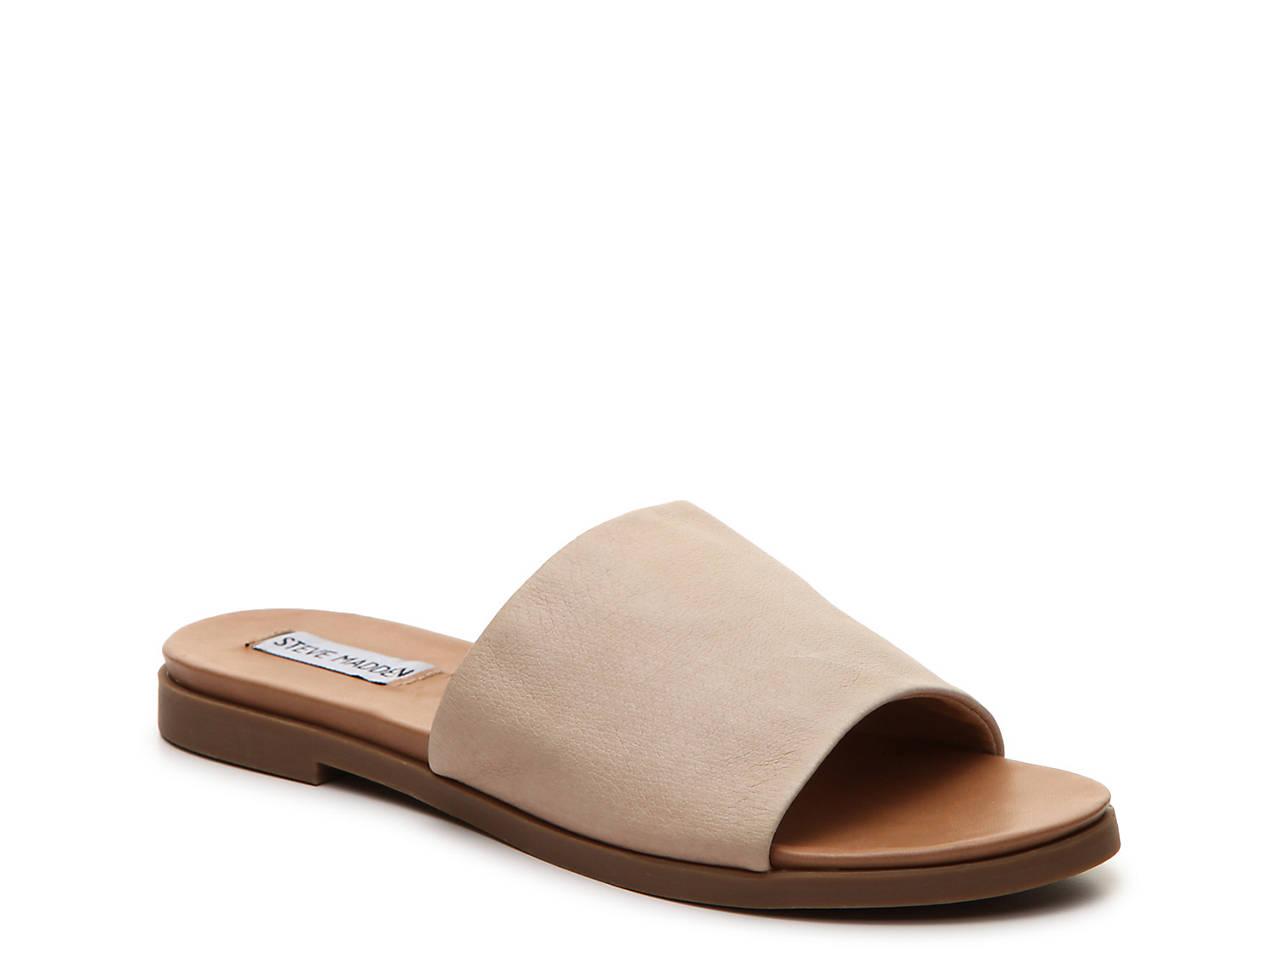 Womens Knot Slider Open Toe Sandals Warehouse RwITvuWwjK